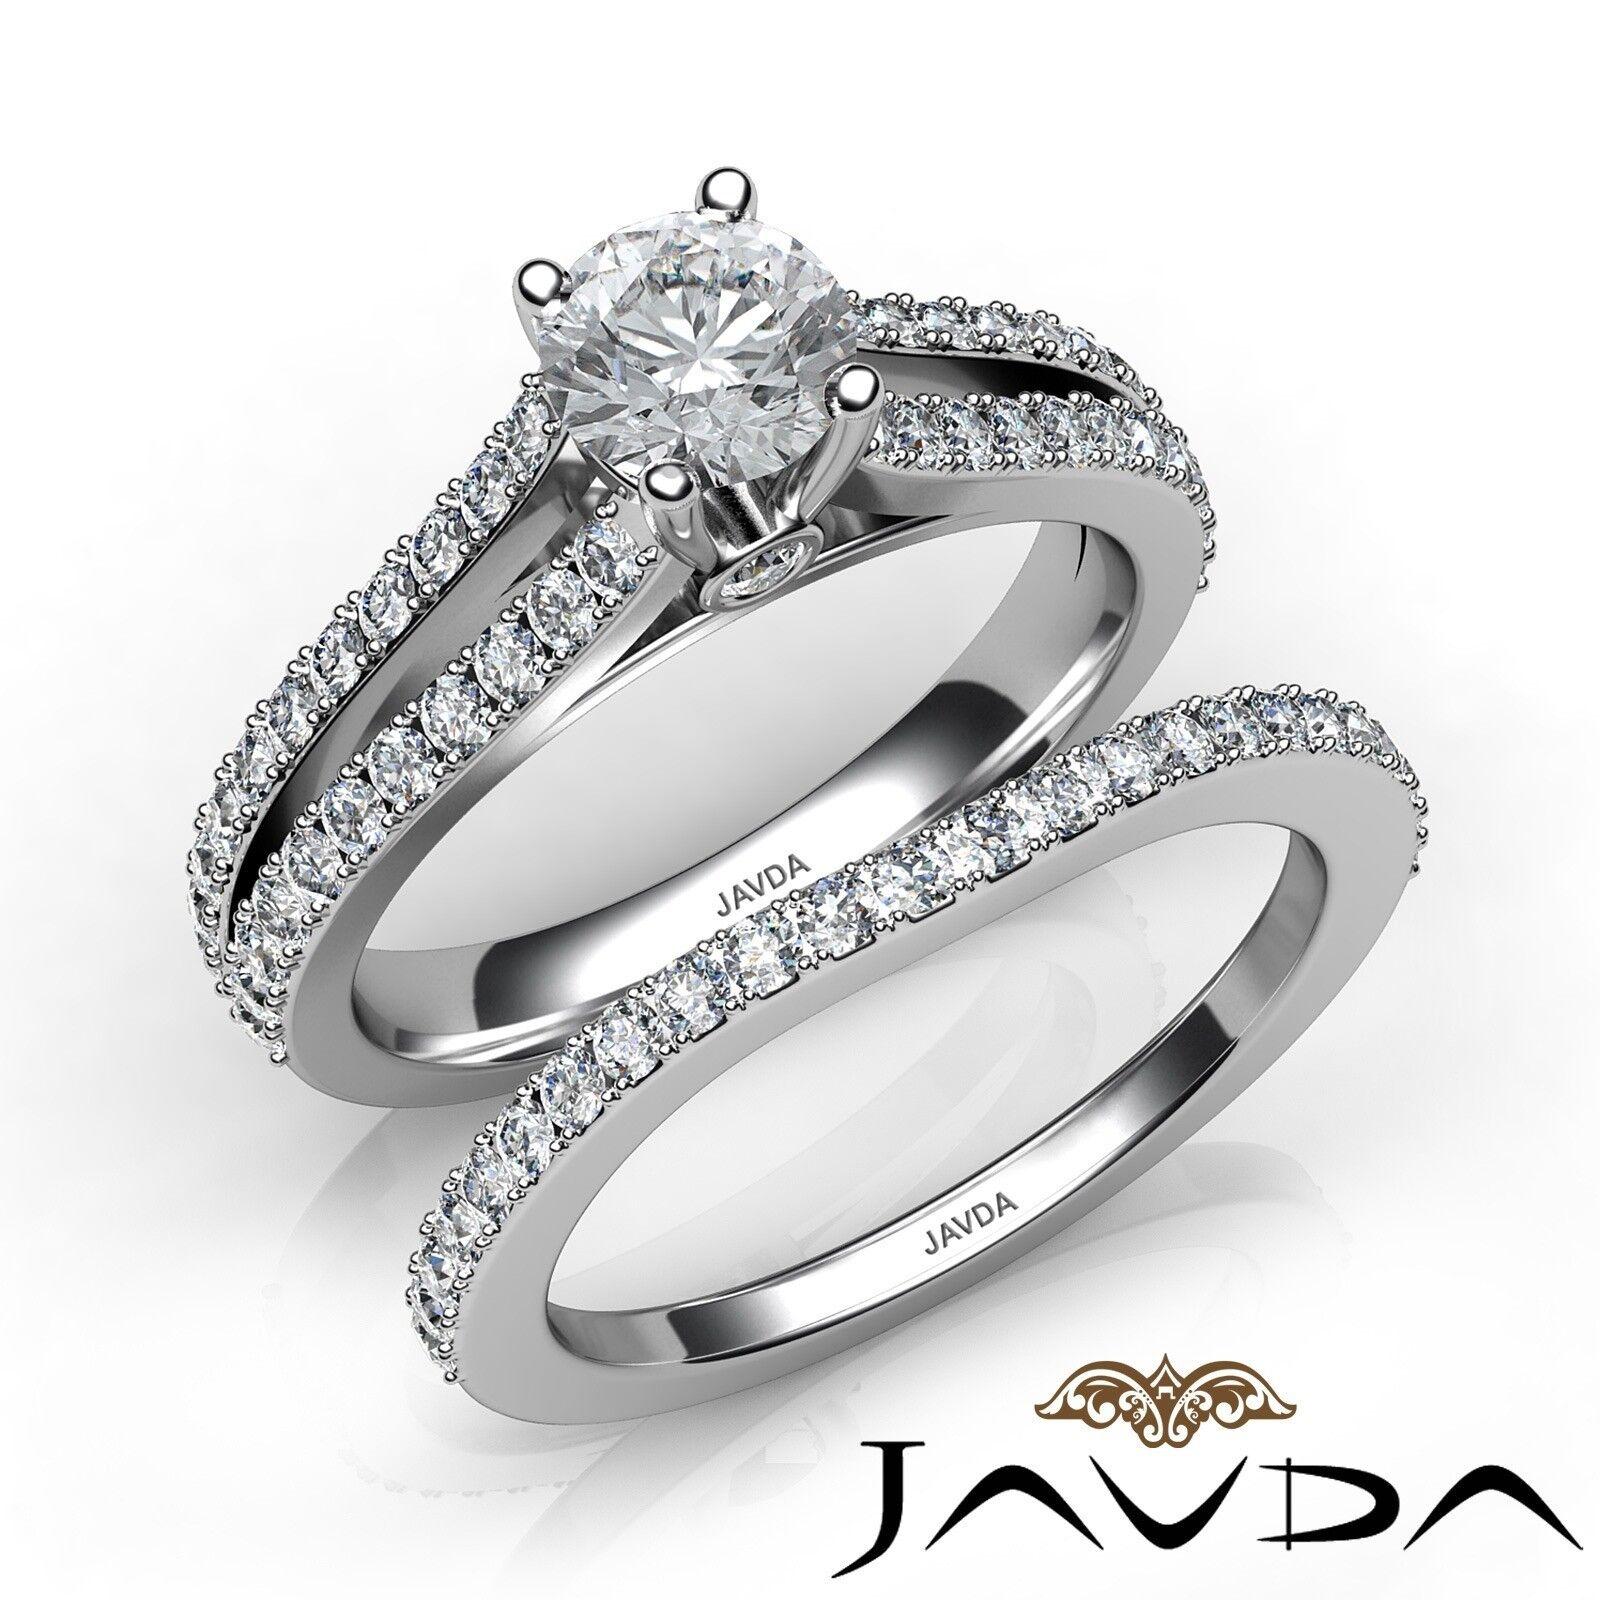 2.2ctw Peekaboo Wedding Bridal Round Diamond Engagement Ring GIA E-VVS2 W Gold